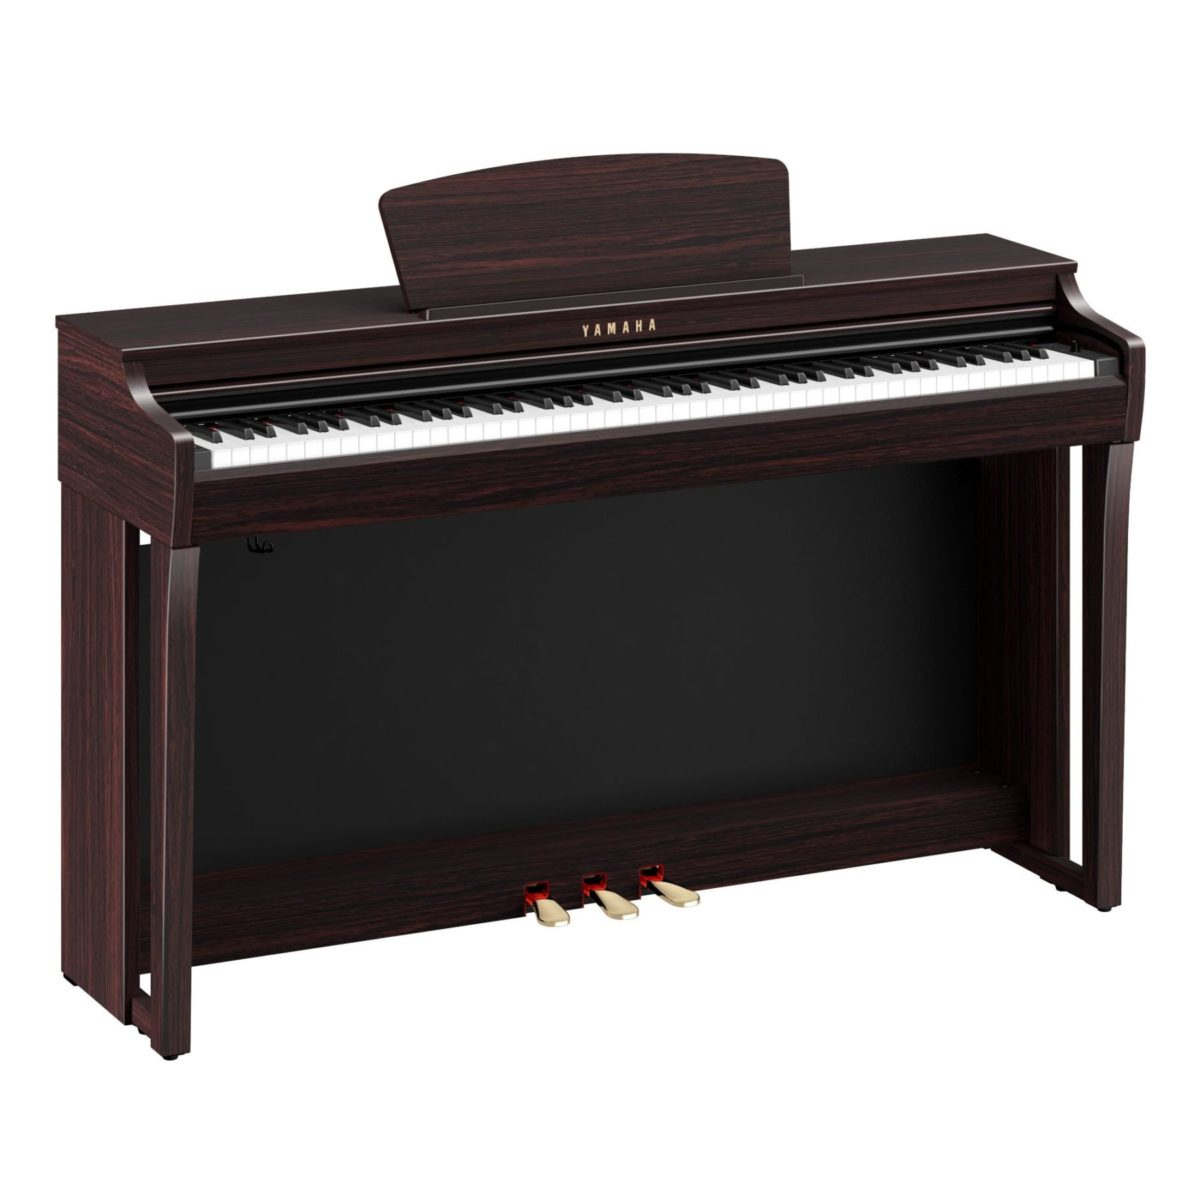 Yamaha CLP-725R Digital Piano